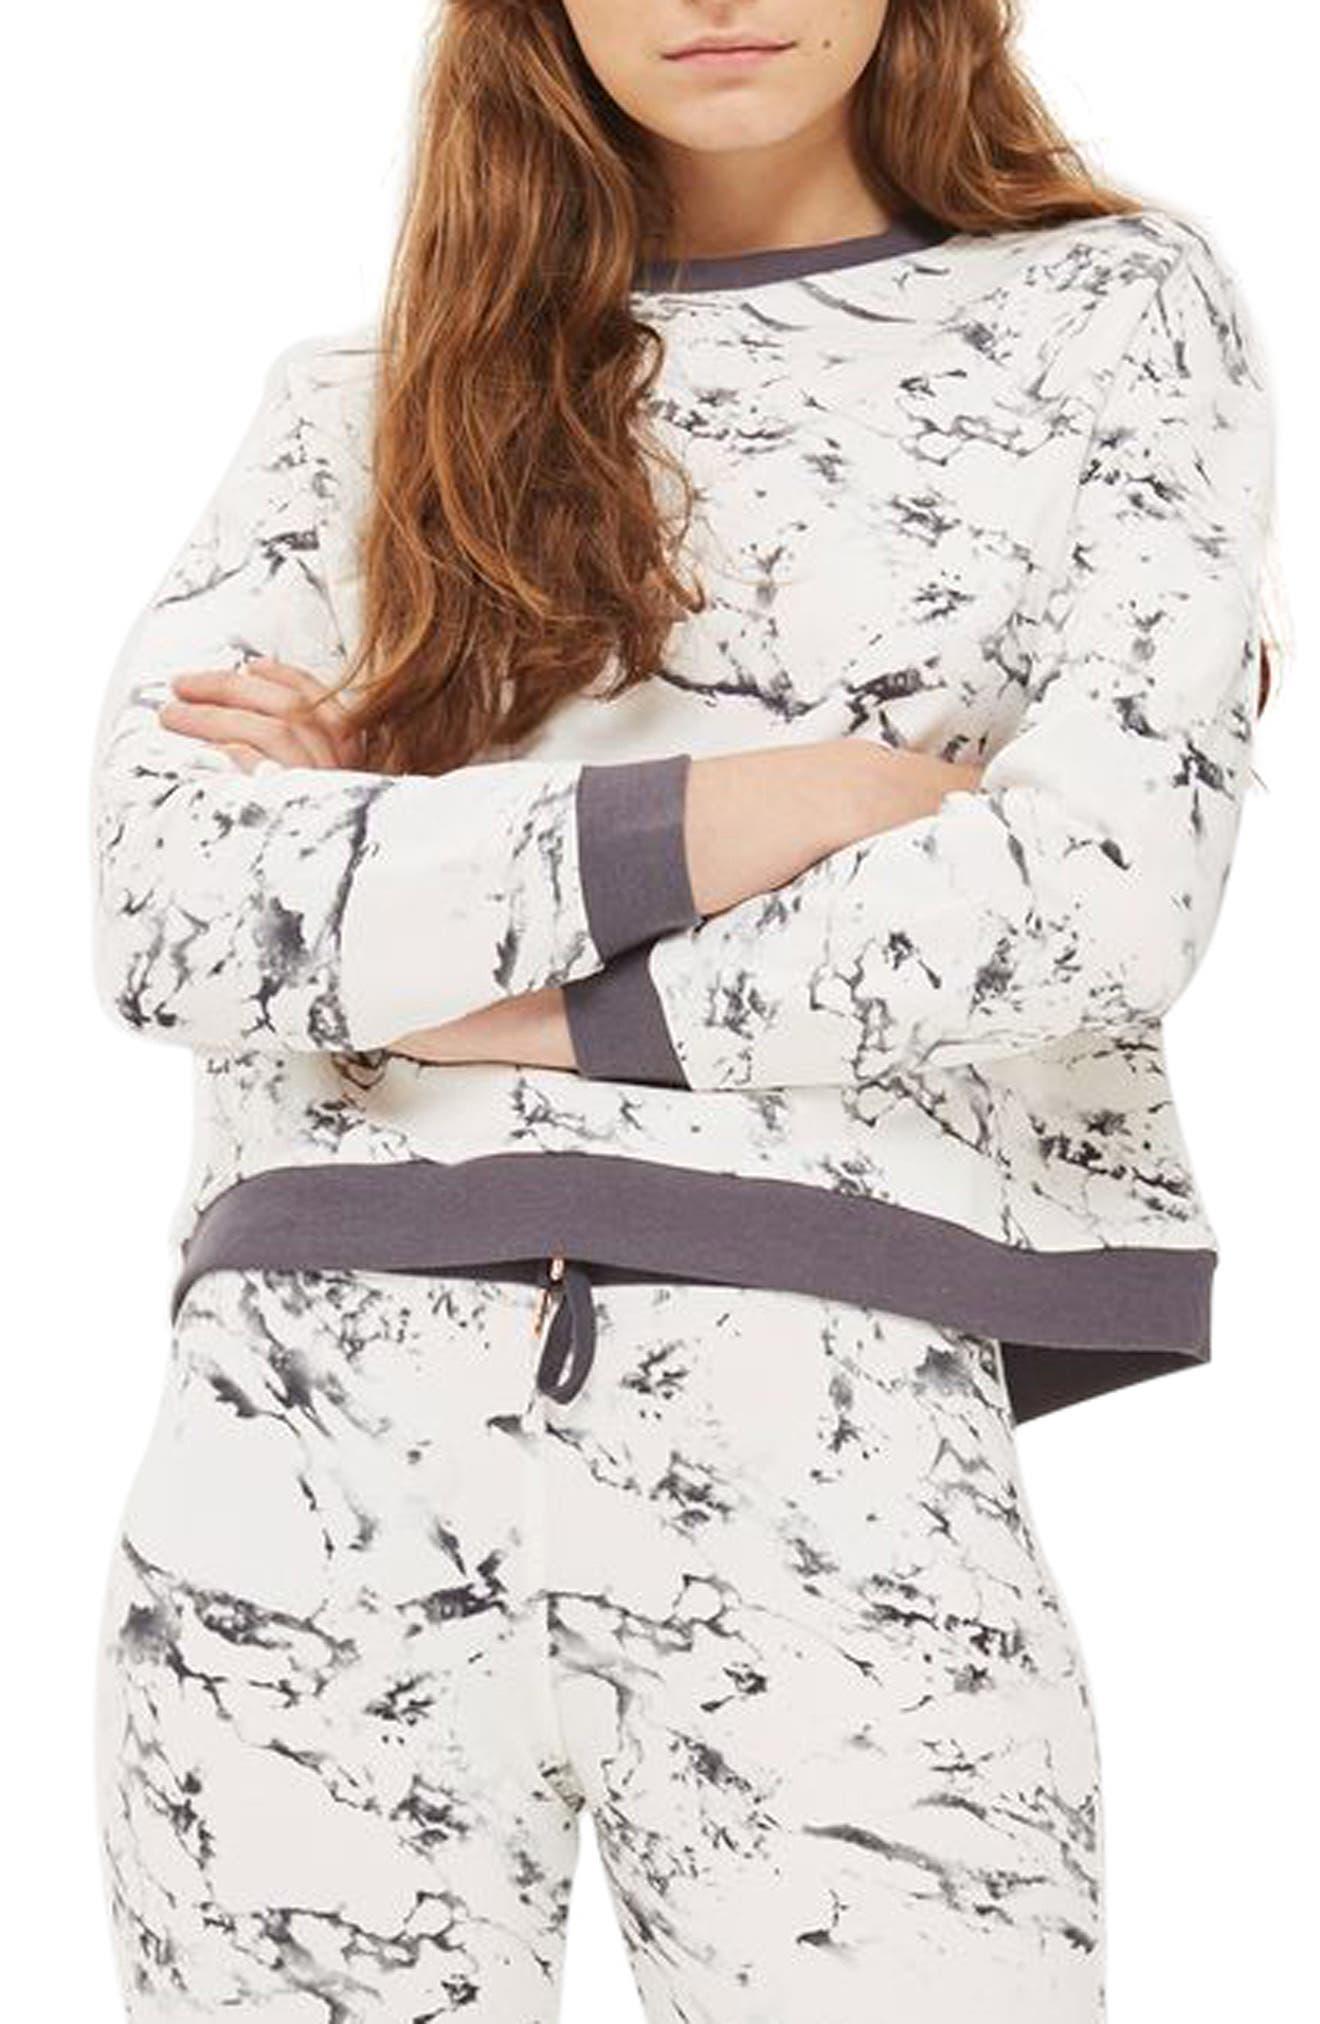 Marble Print Lounge Sweatshirt,                         Main,                         color, Grey Multi